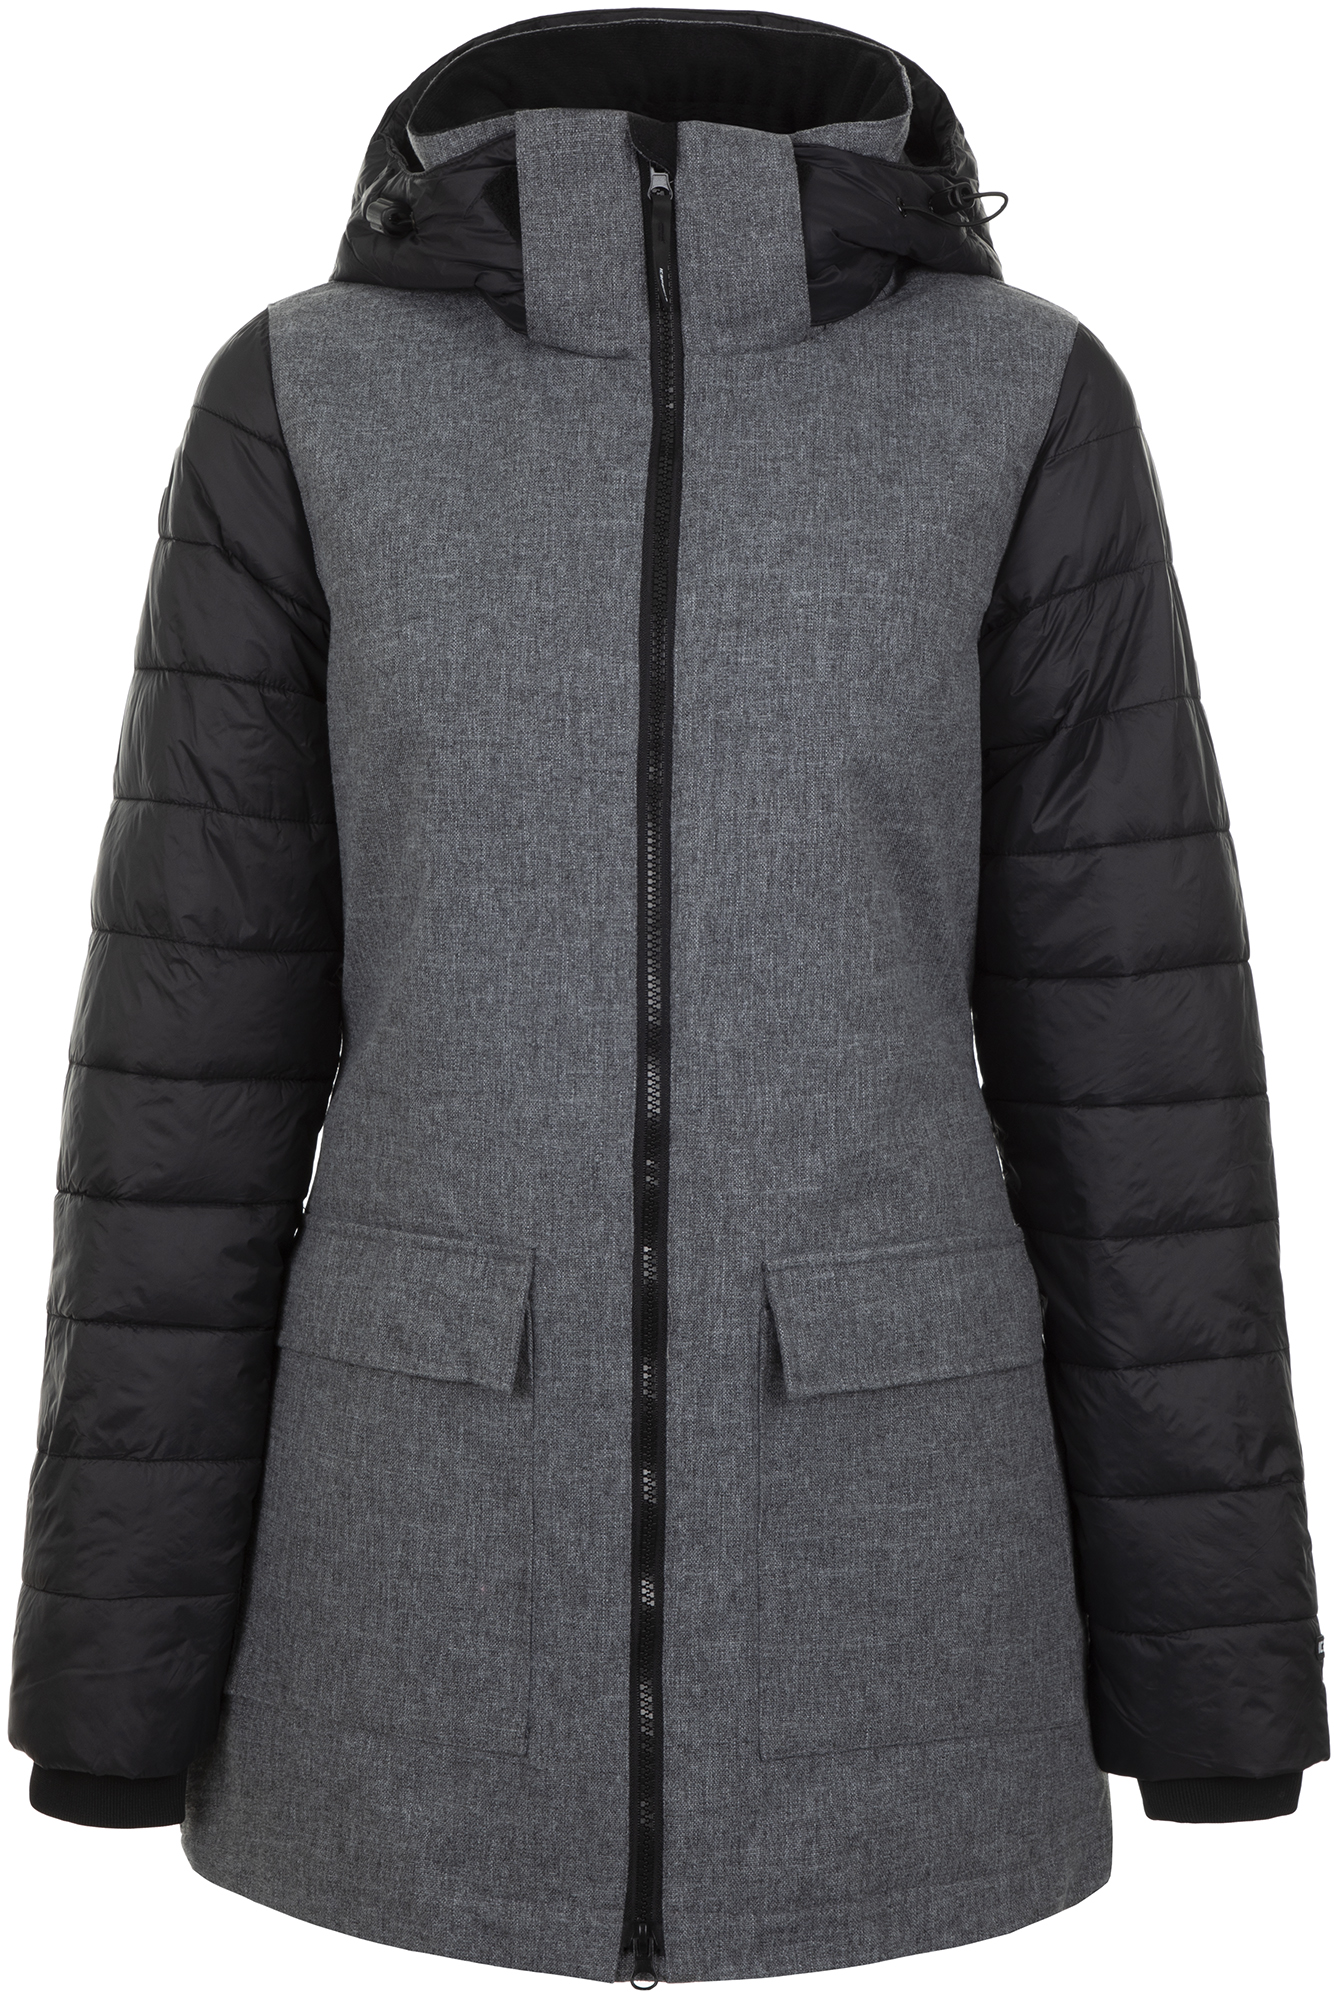 IcePeak Куртка утепленная женская IcePeak Loona, размер 48